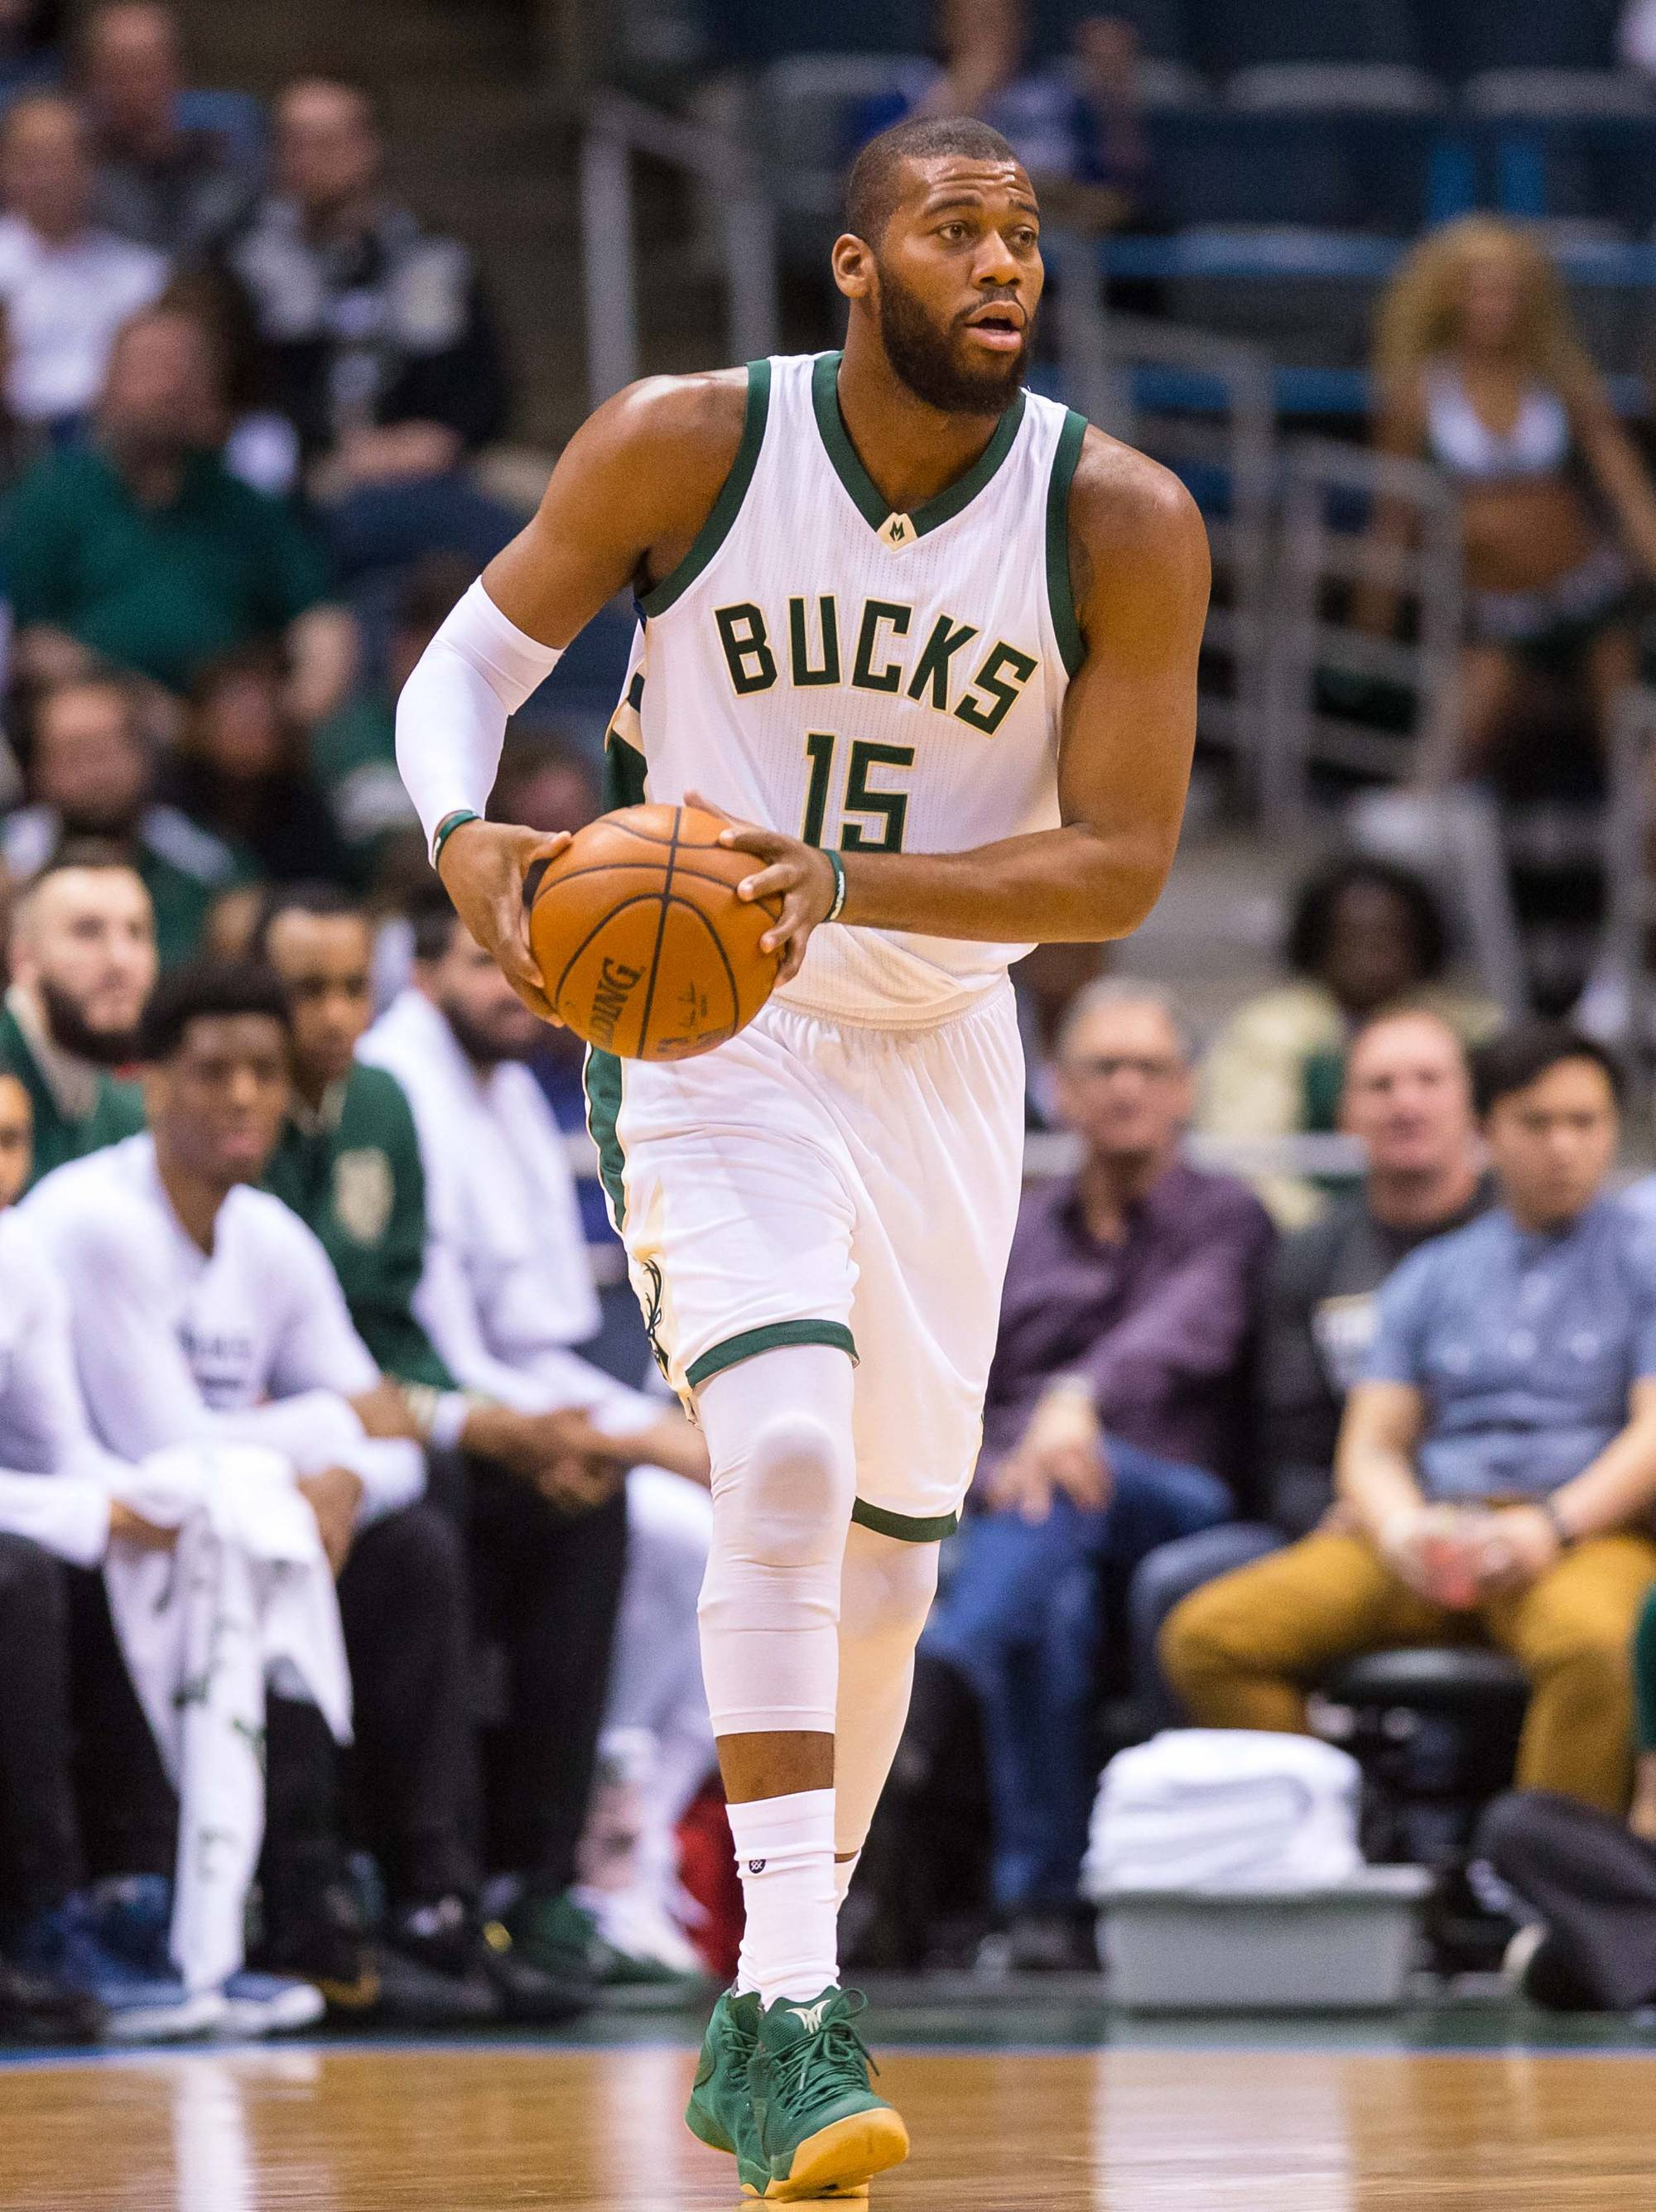 The San Antonio Spurs should trade for Milwaukee Bucks center Greg Monroe